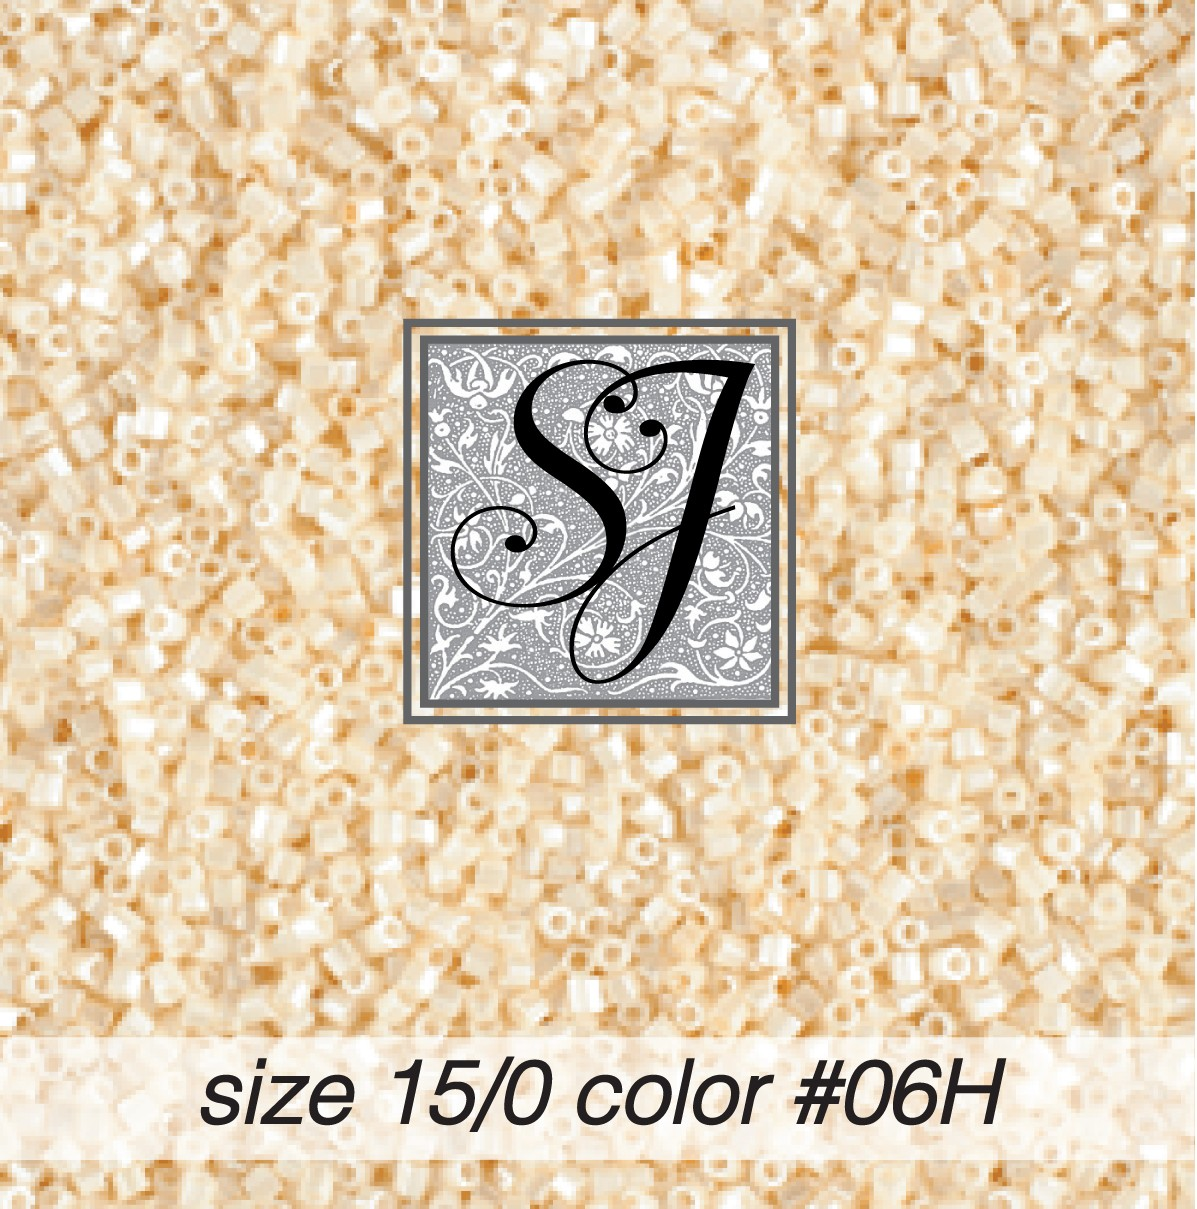 06H Crème Pearl Hex-Cut 15/0 Seed Bead